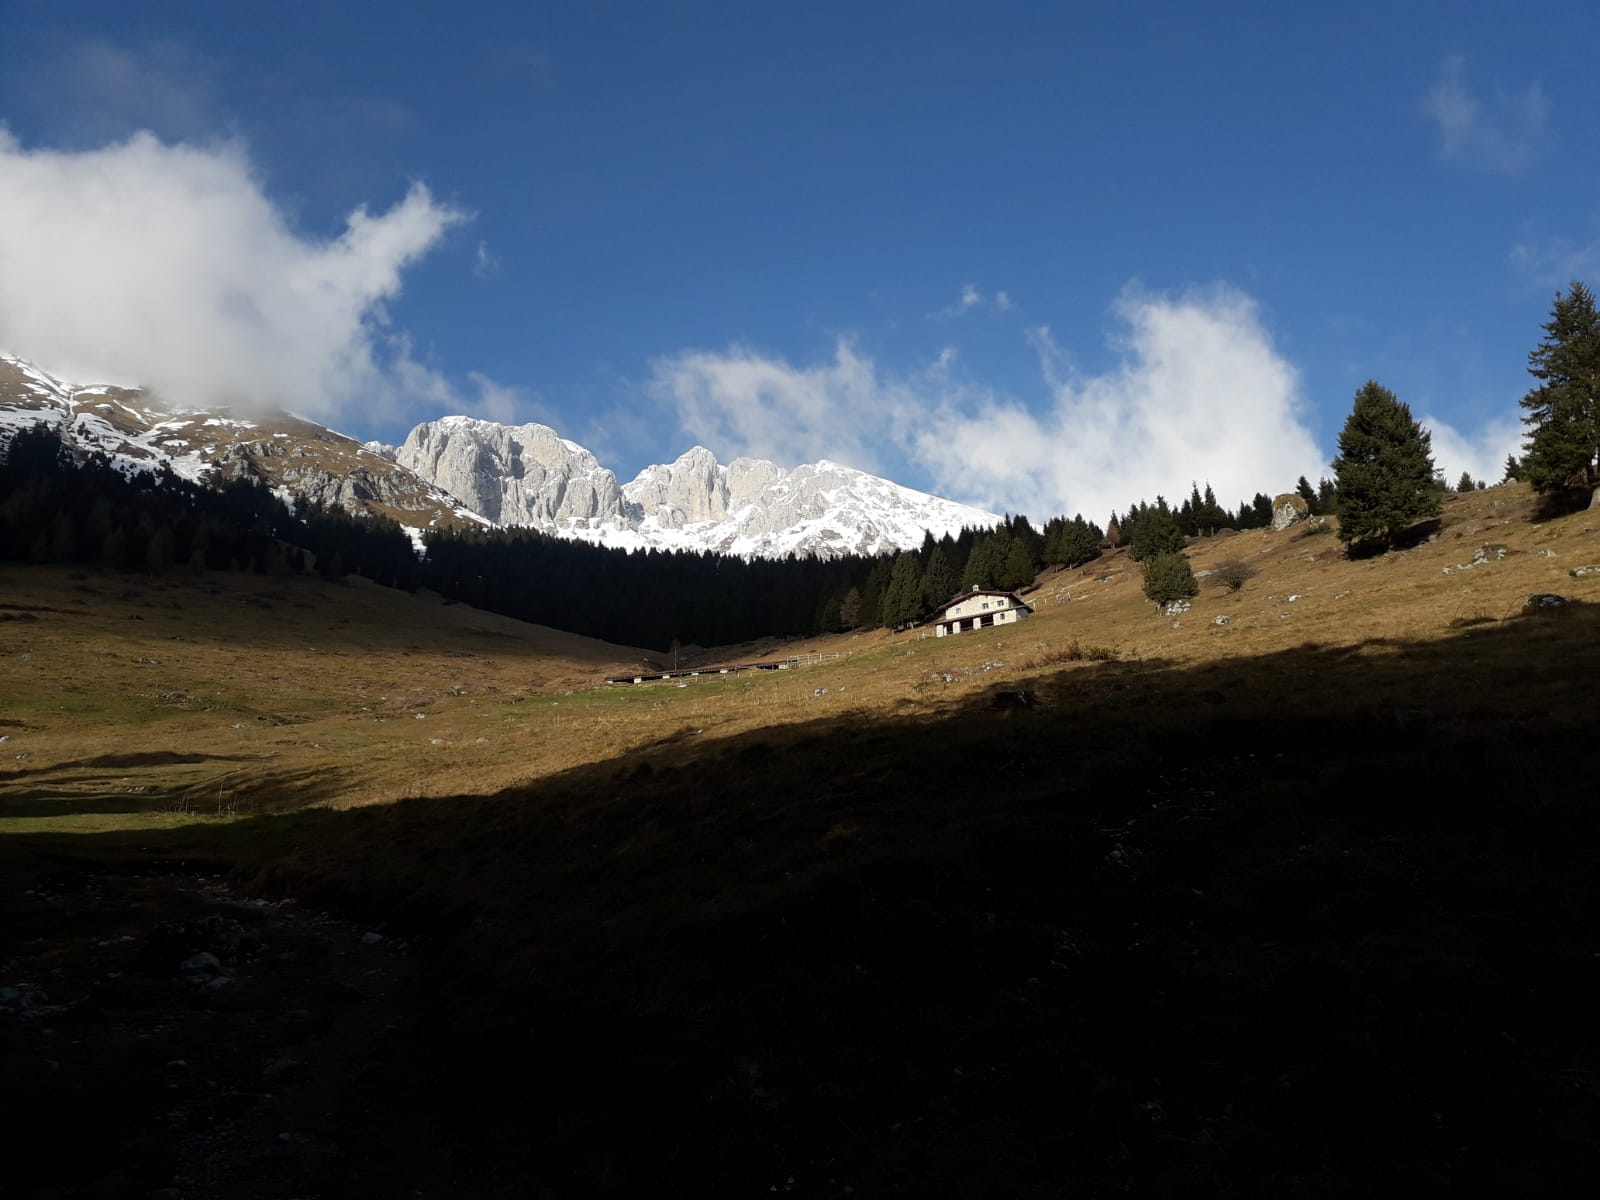 Trekking - La Regina delle Orobie @ Cantoniera della Presolana